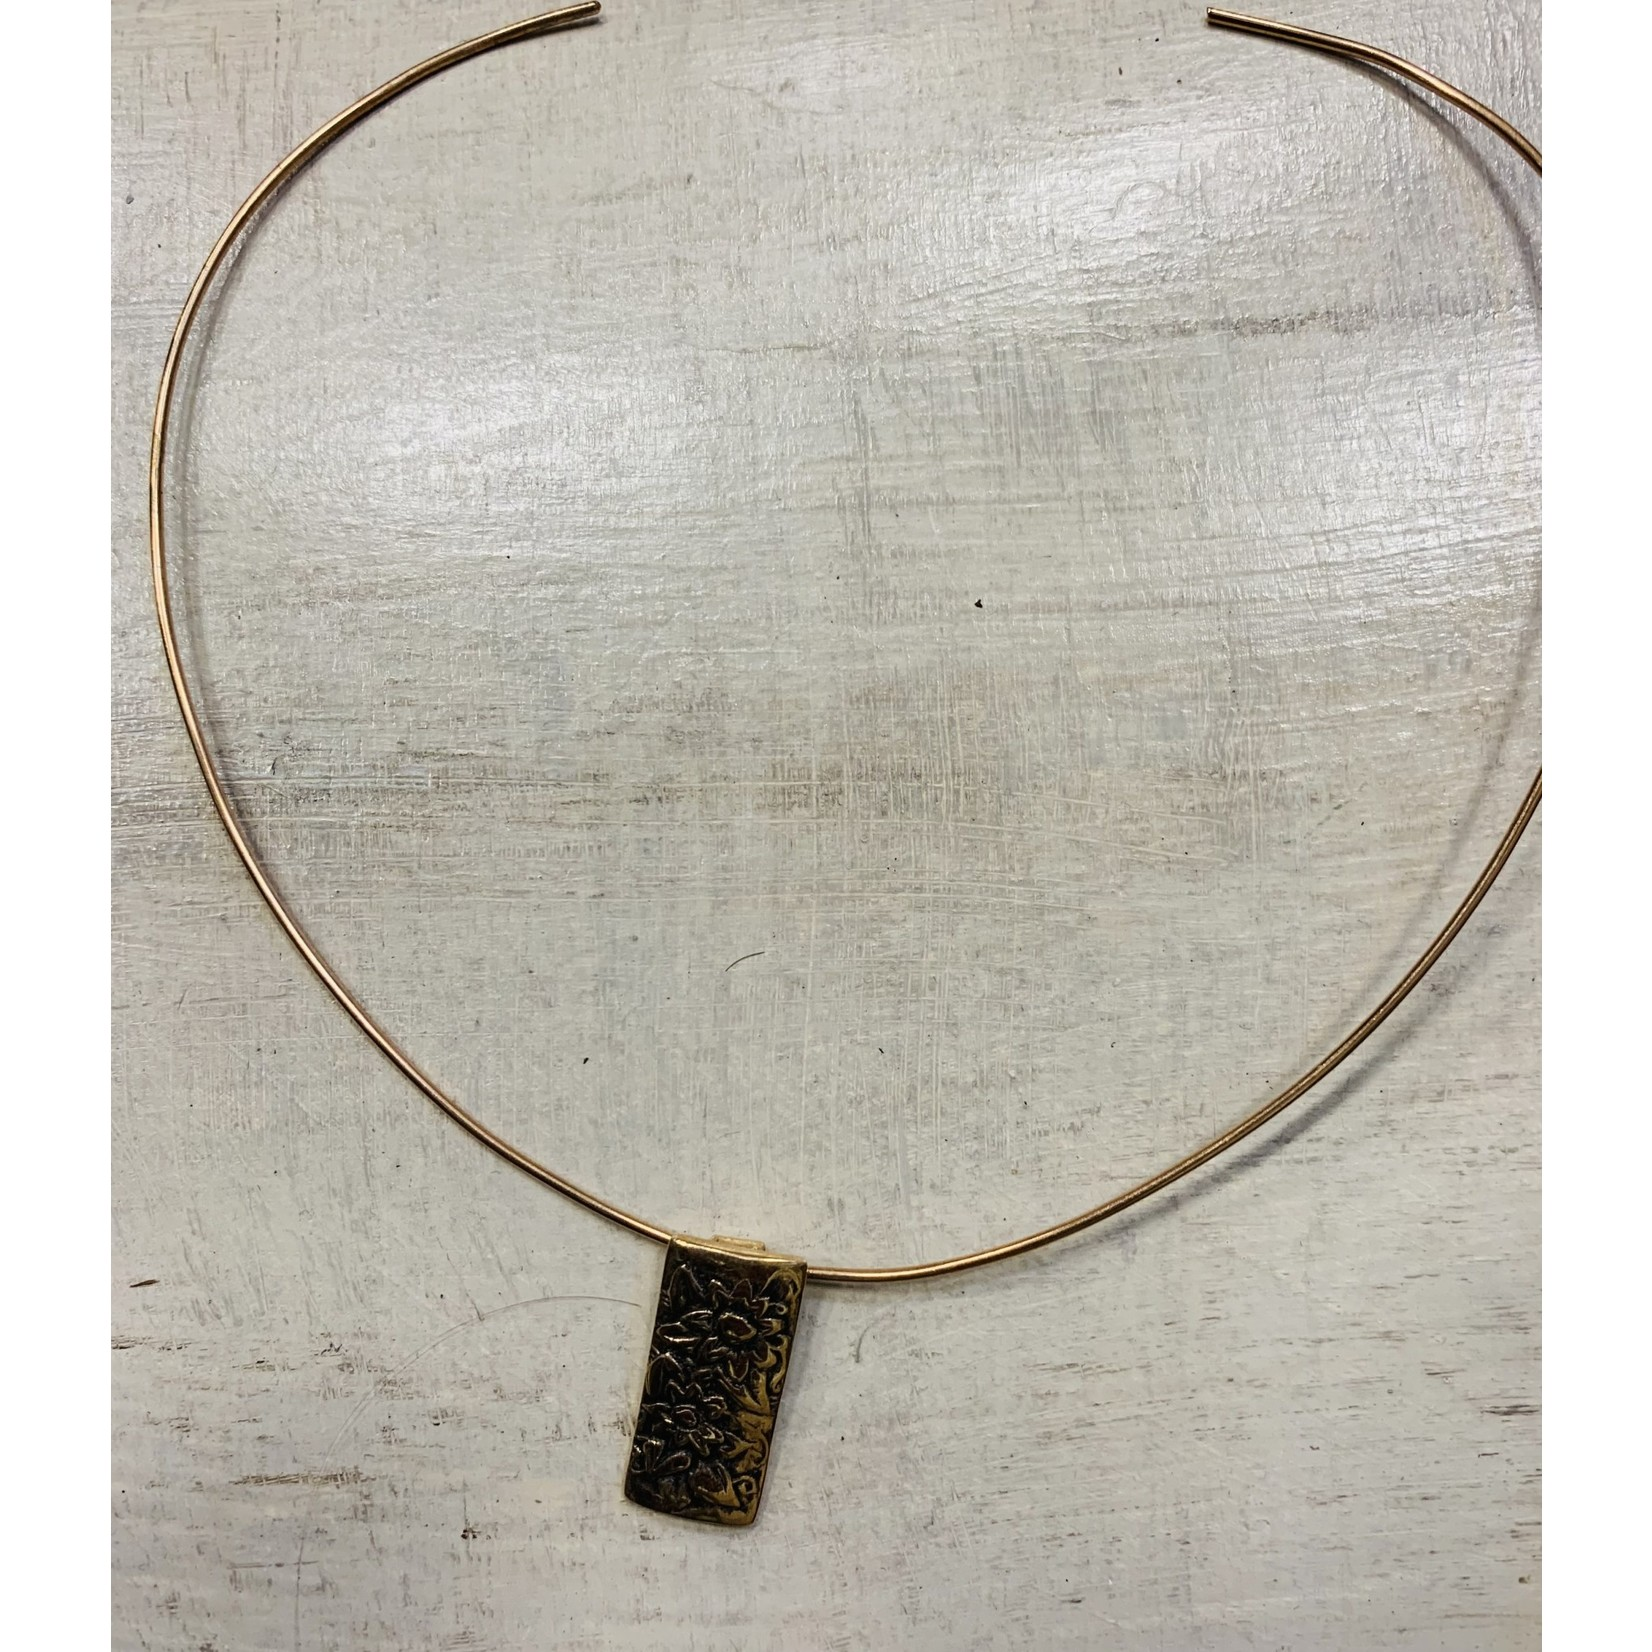 Liz Sabol Liz Sabol Secret Garden pendant on bronze neckwire